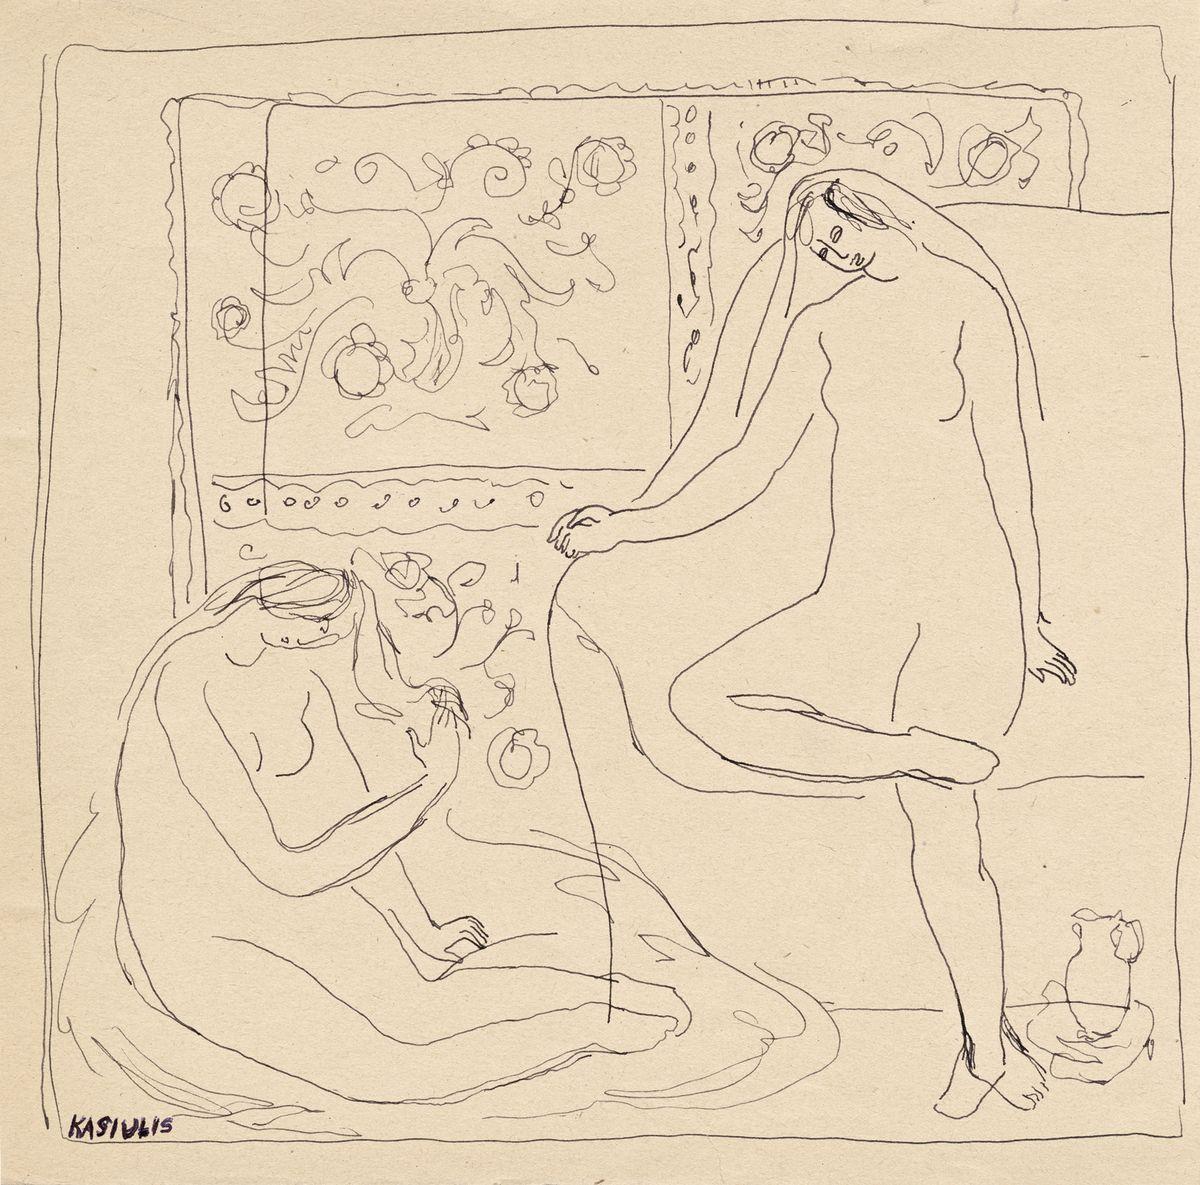 Dvi moterys (kompozicijos fragmentas), V.Kasiulis, 1948.